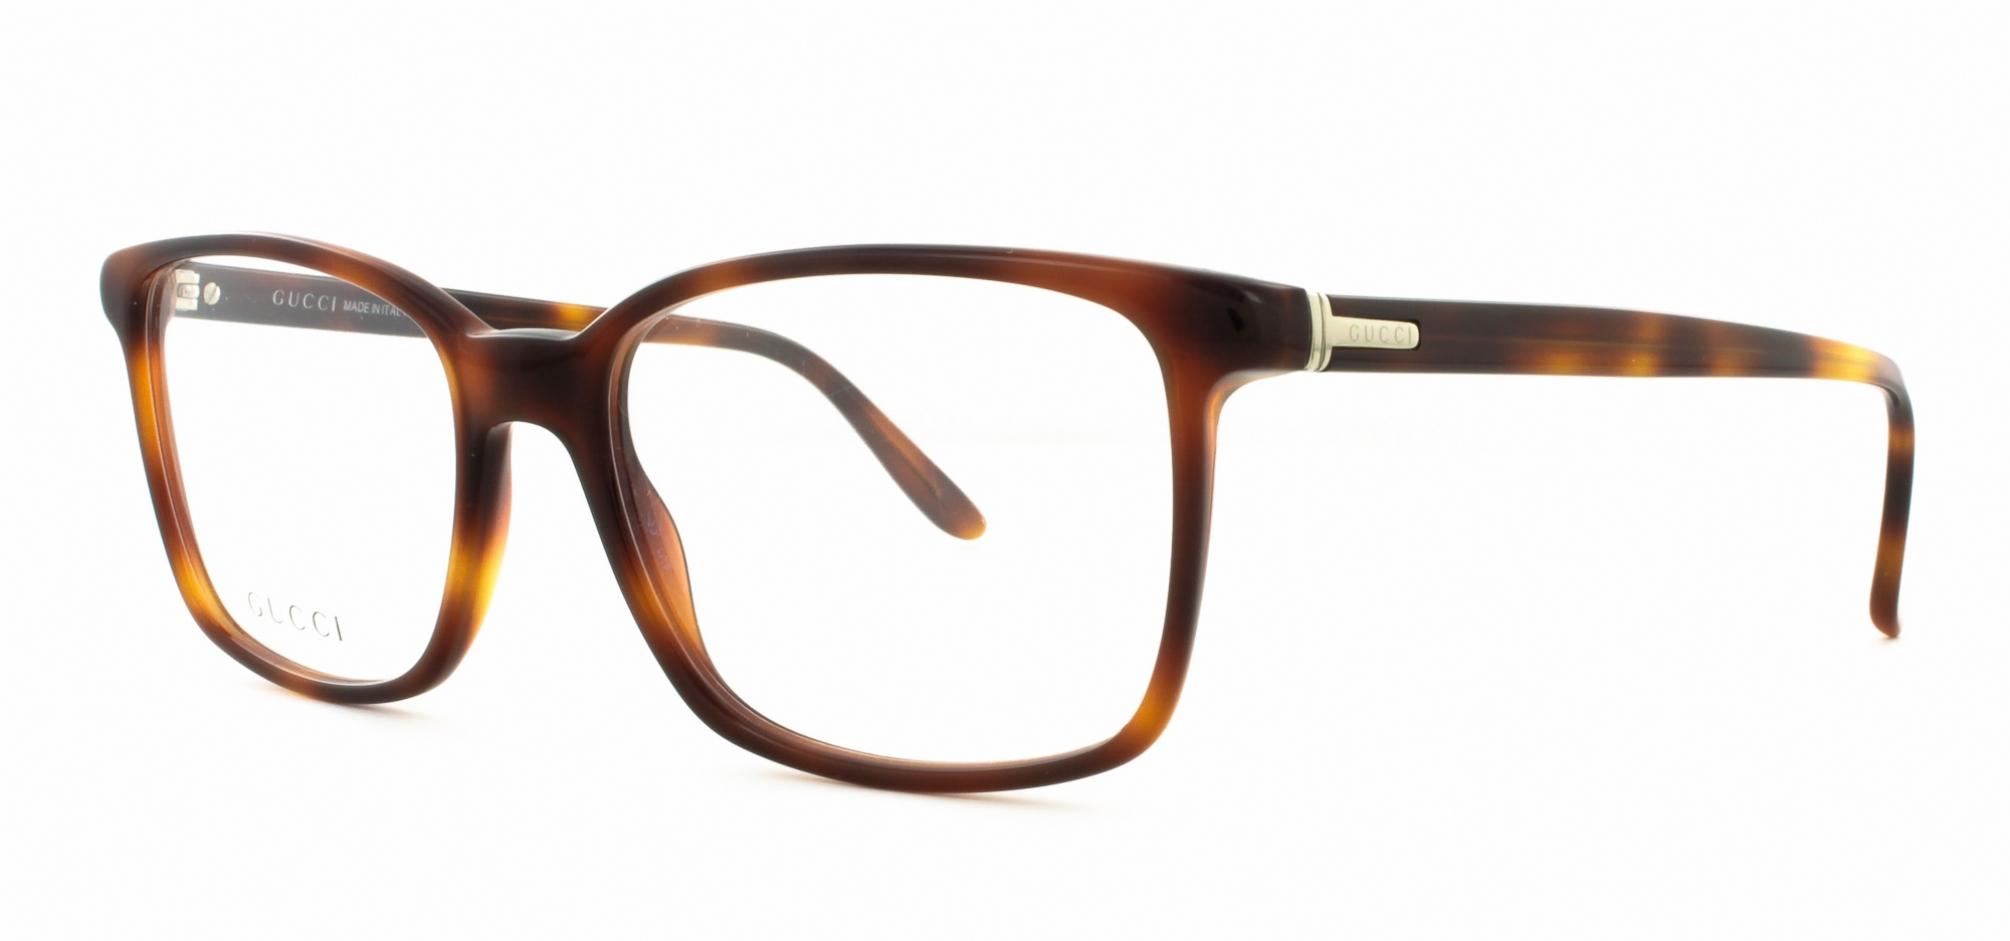 e8303f5f380 Buy Gucci Eyeglasses directly from eyeglassesdepot.com